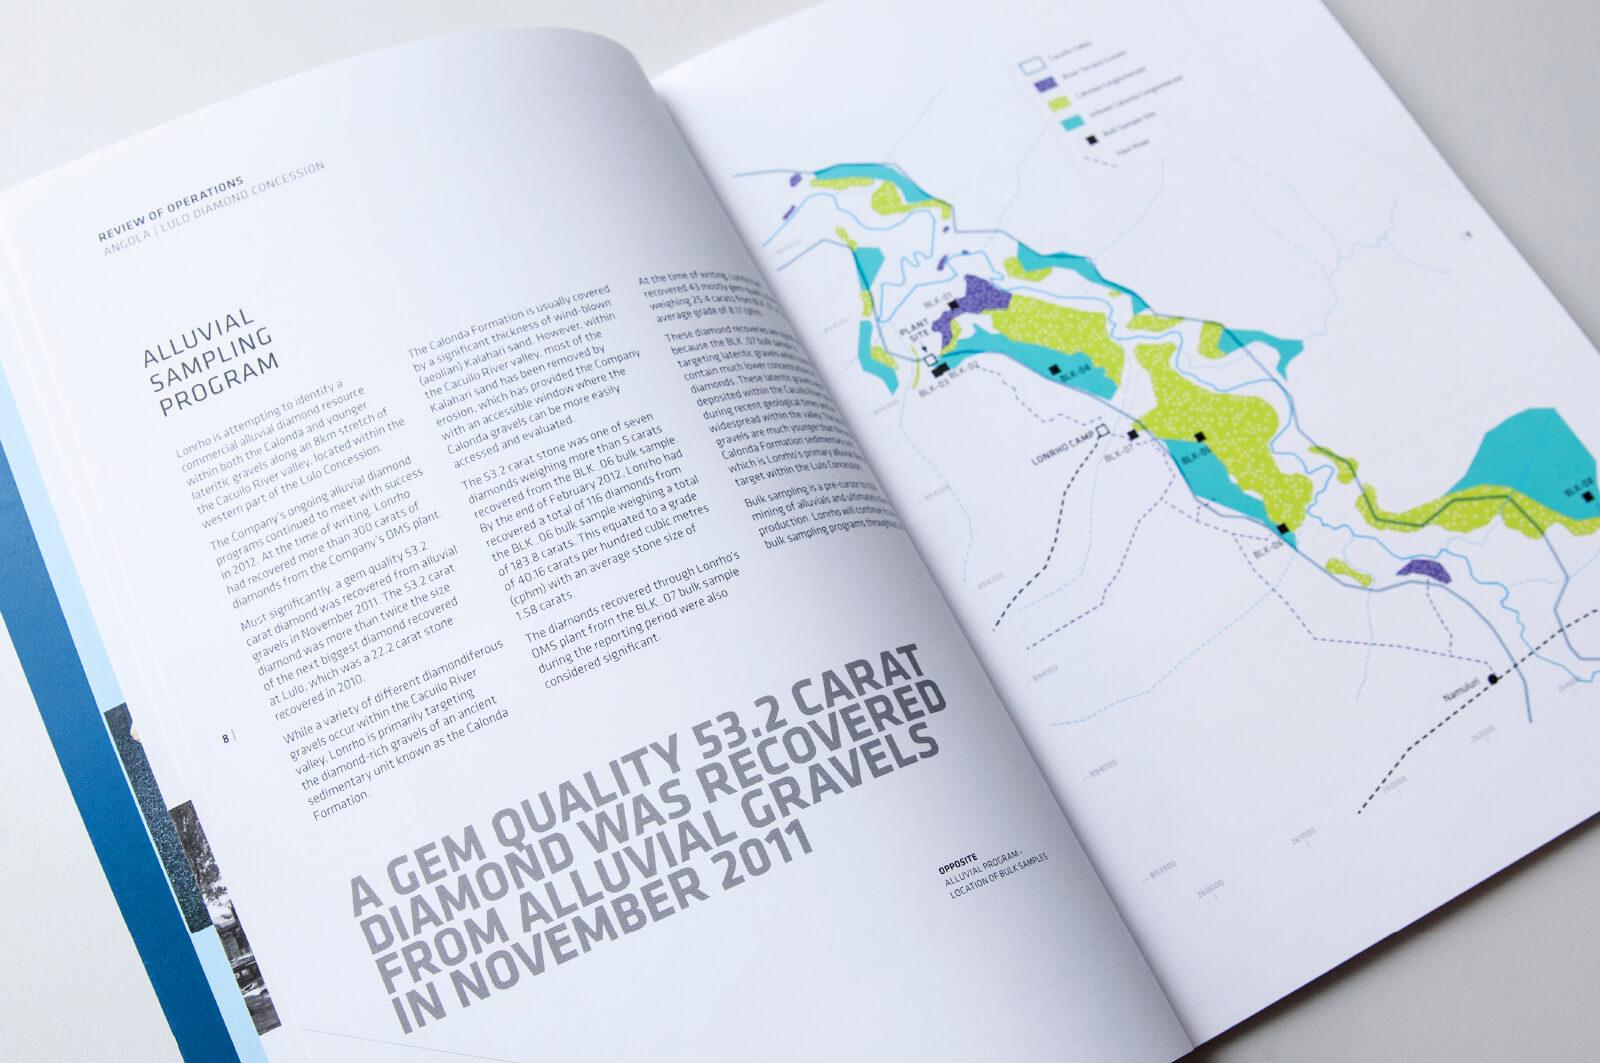 Lonrho-annual-report-2012-4